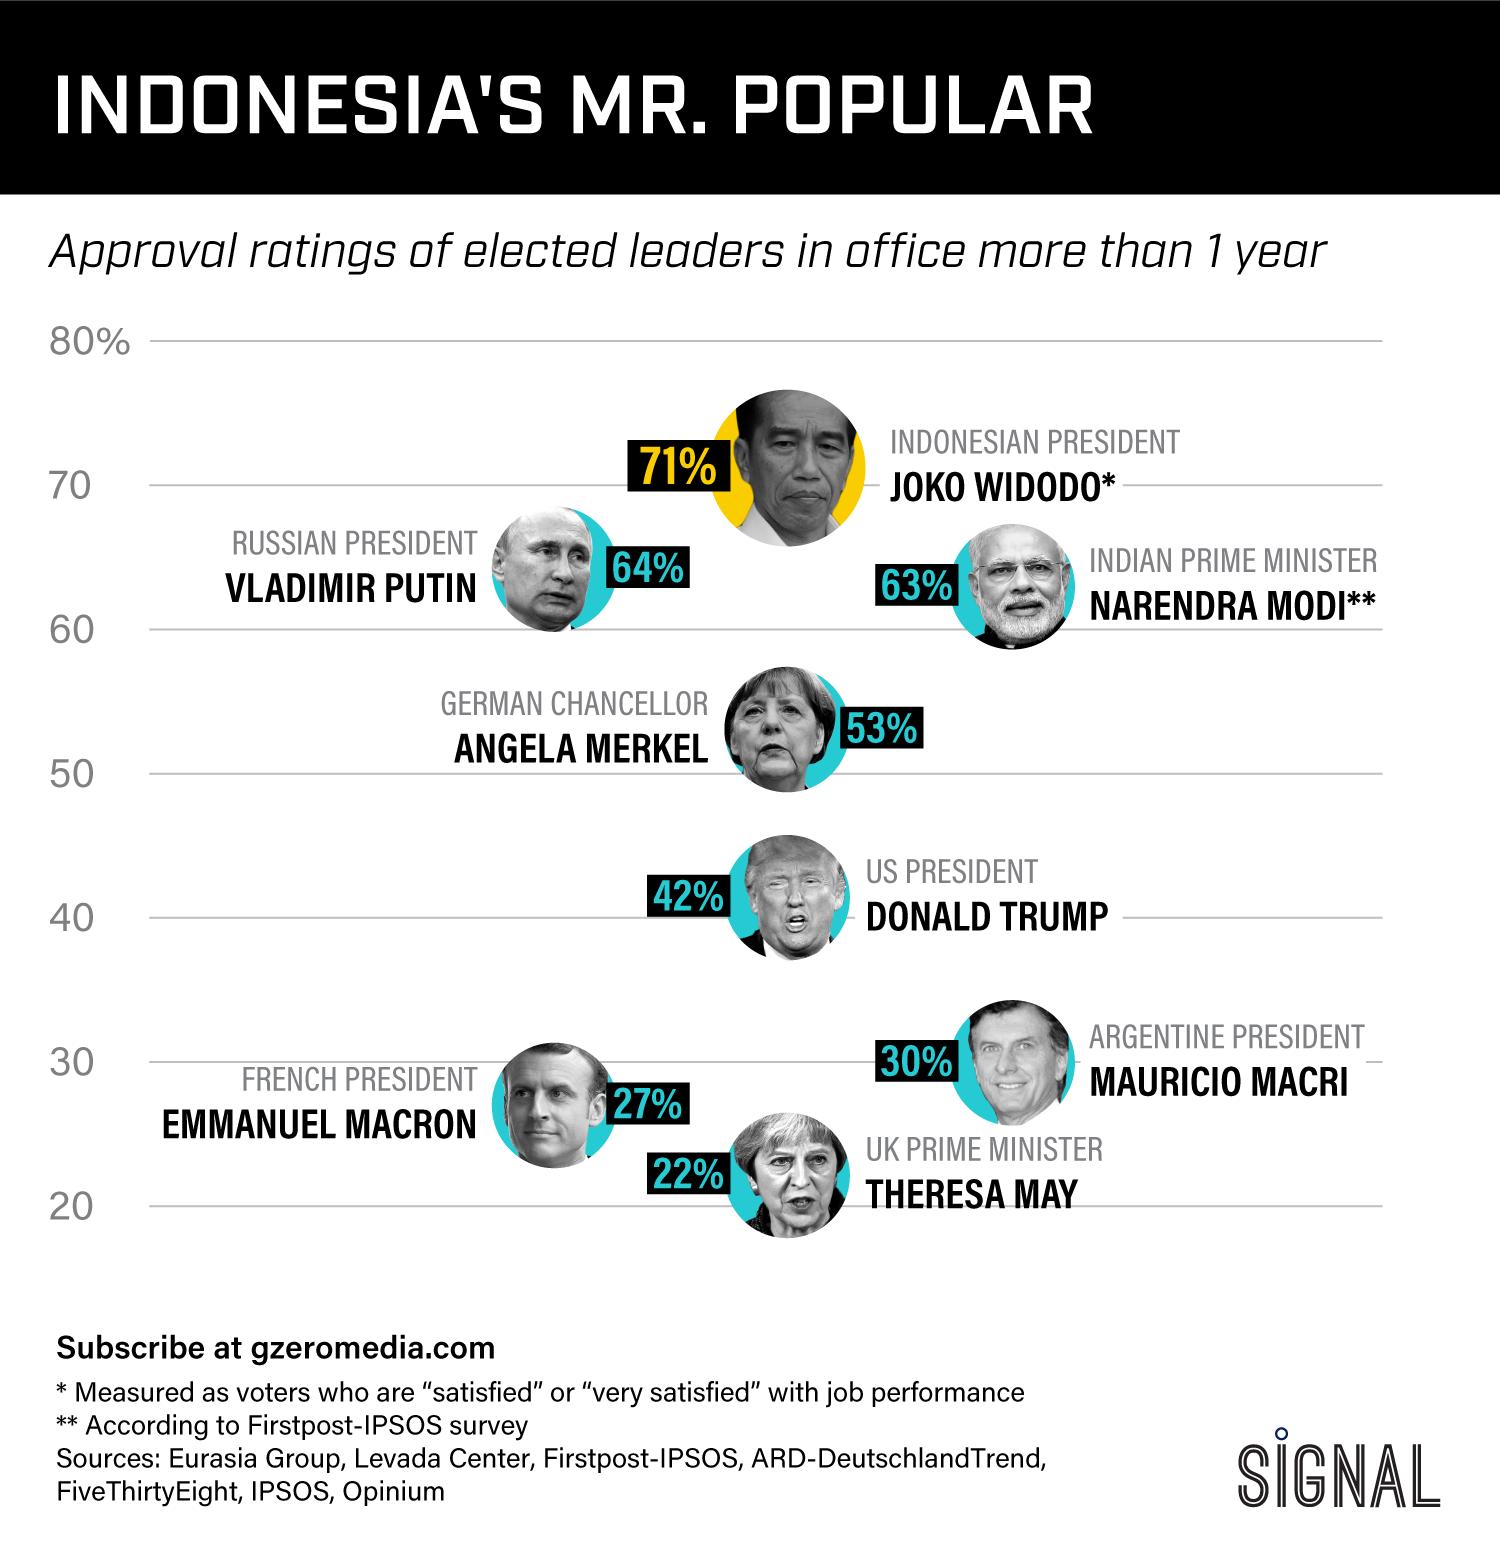 Graphic Truth: Indonesia's Mr. Popular